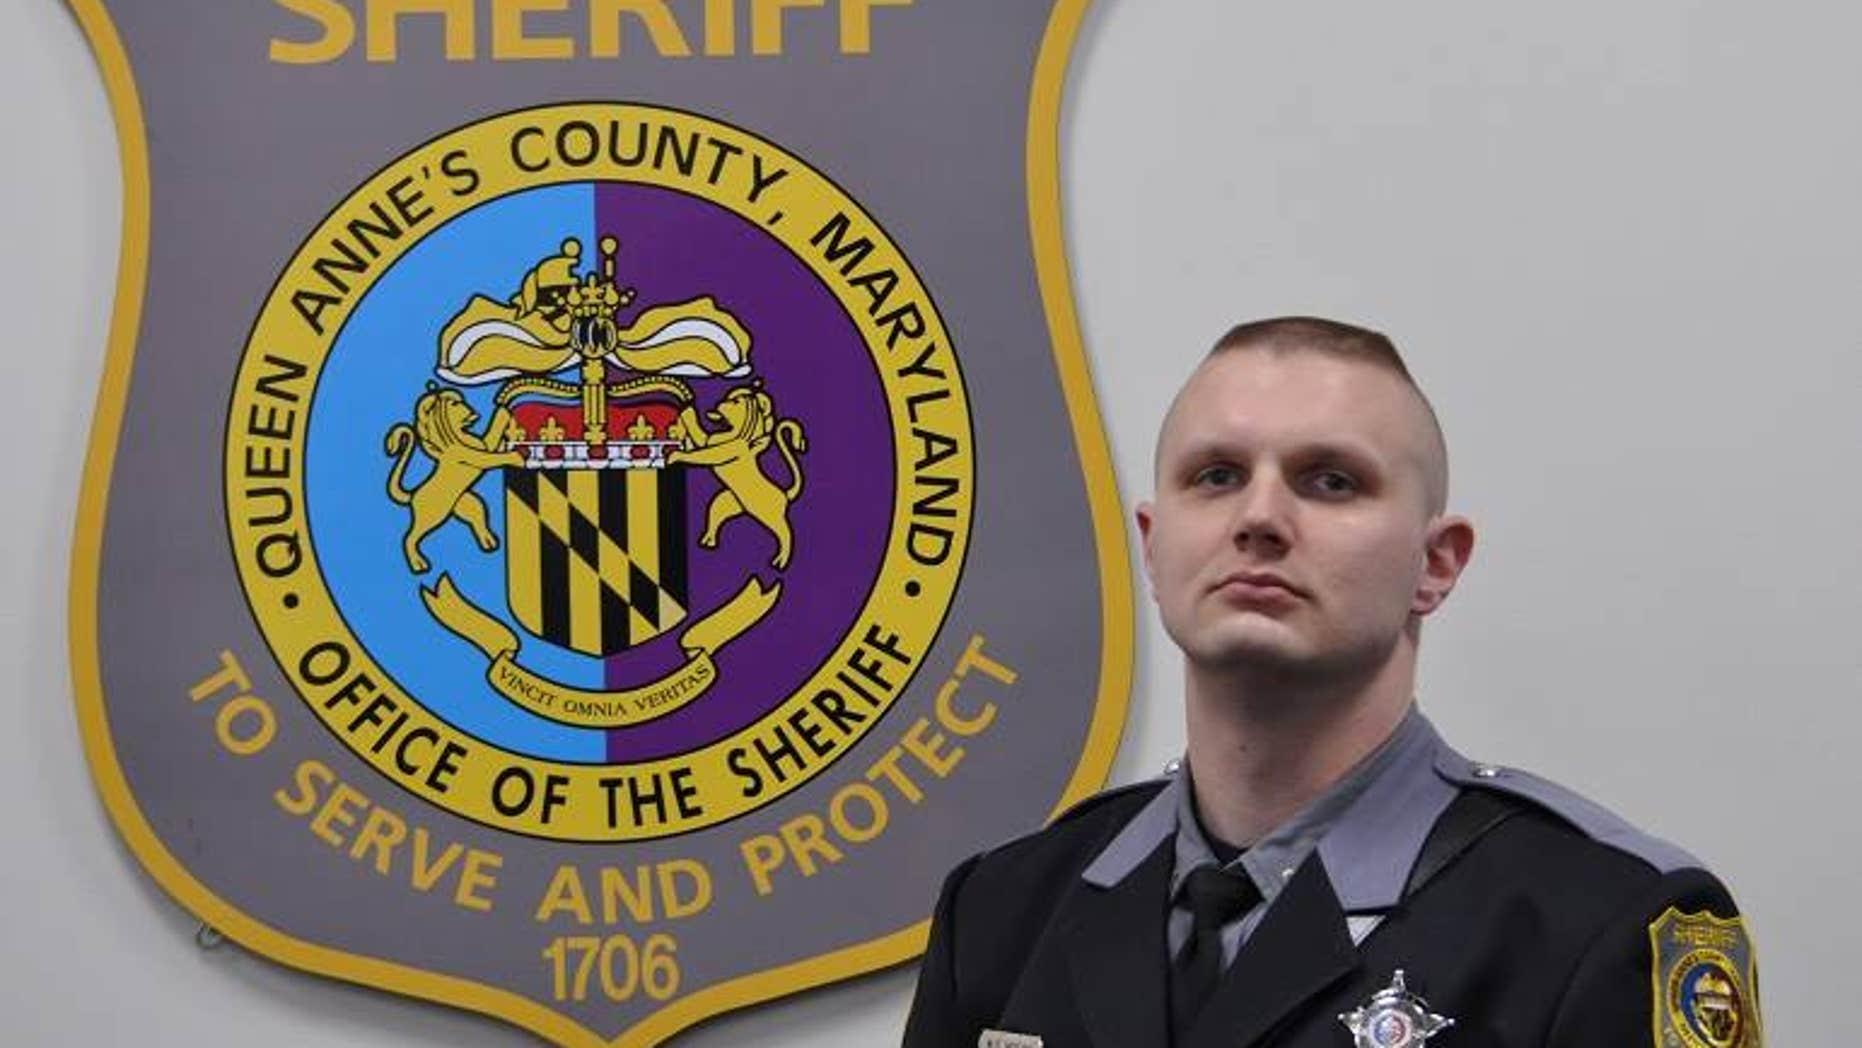 Dfc. Warren Scott Hogan was in critical condition on Thursday.